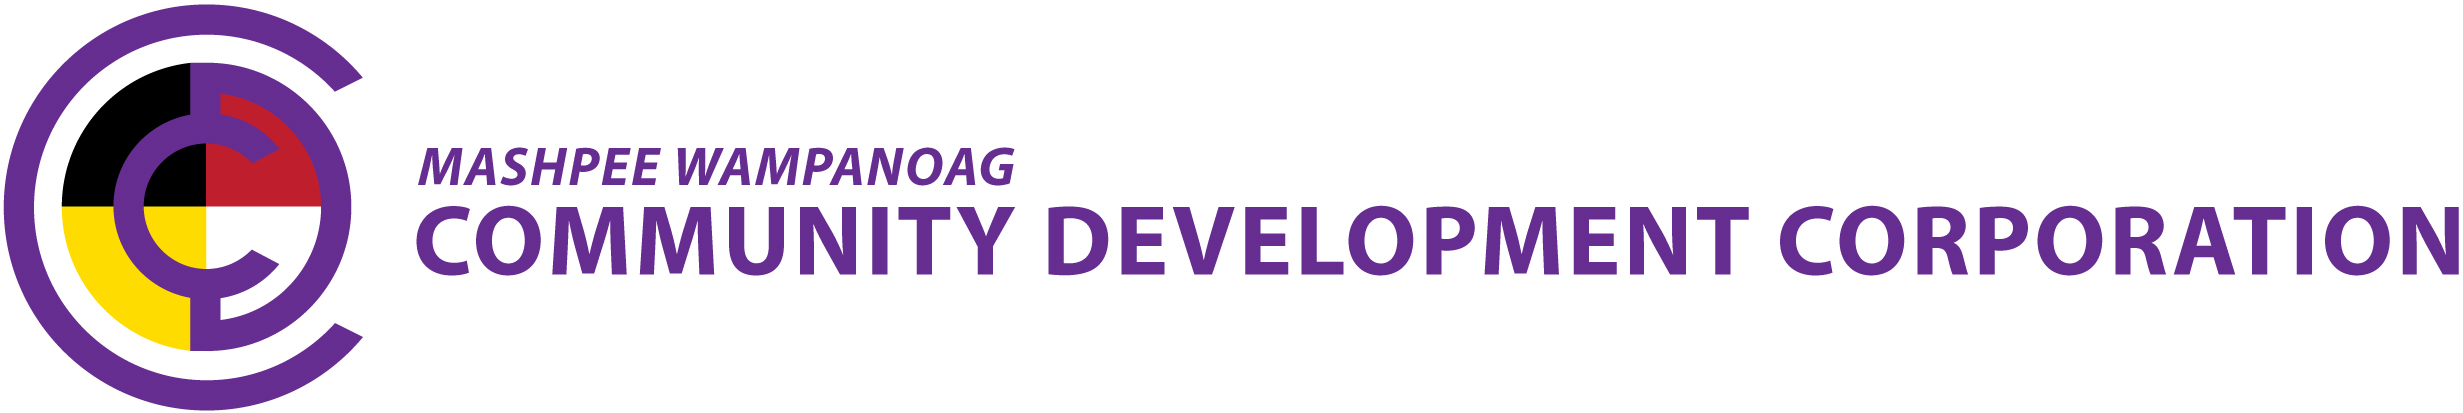 cdc-logo-concept-d.jpg